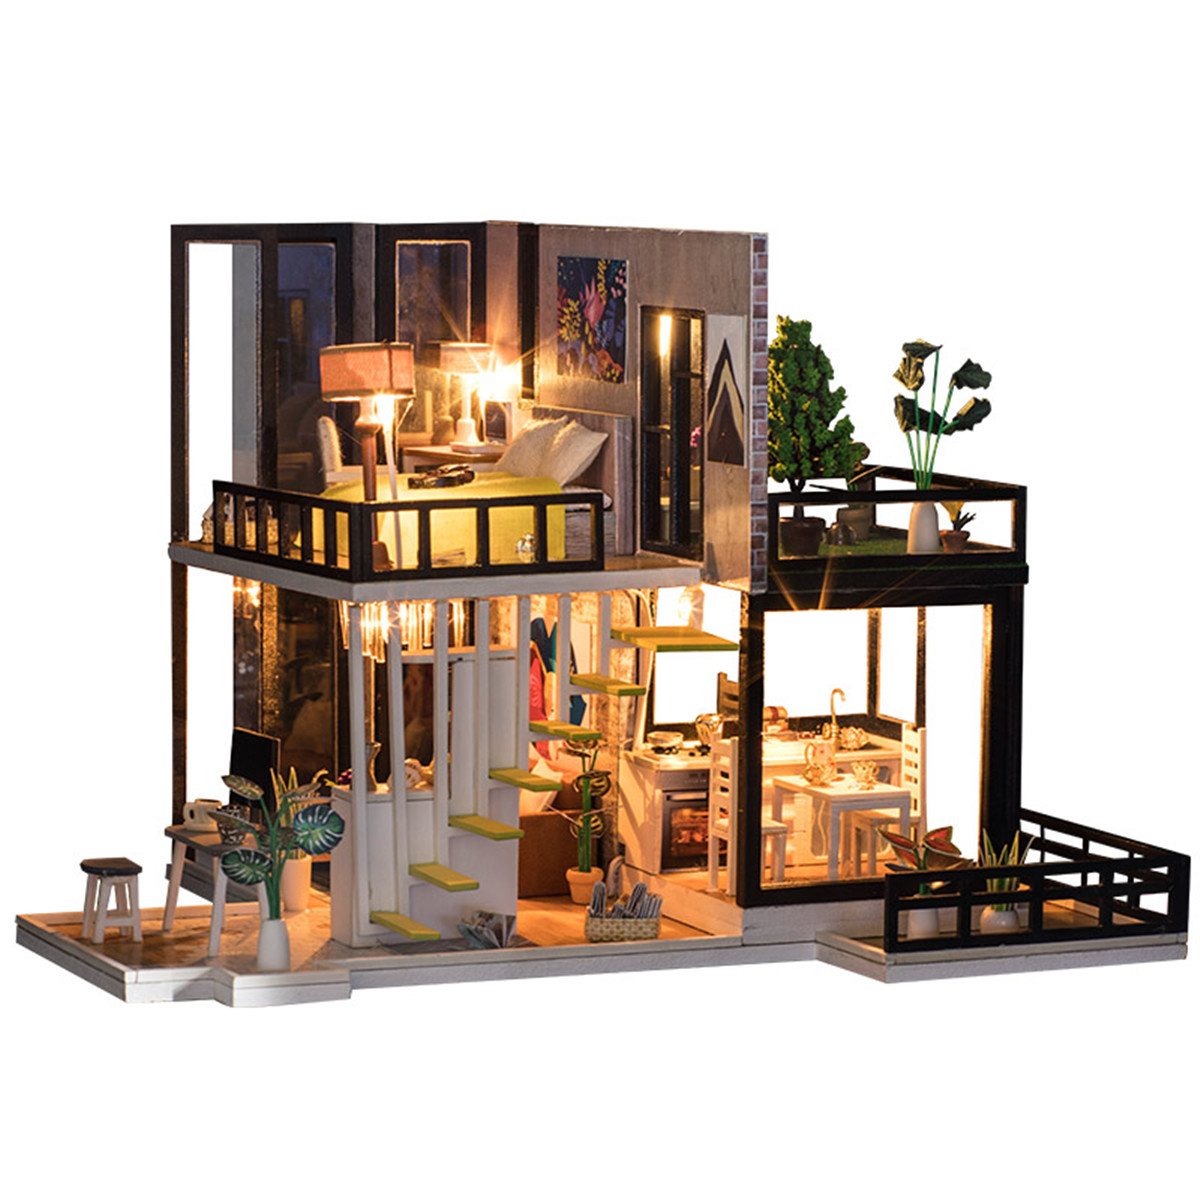 Miniature Dollhouse DIY Handcraft Kit Furnitures Wooden House  Romantic Gift